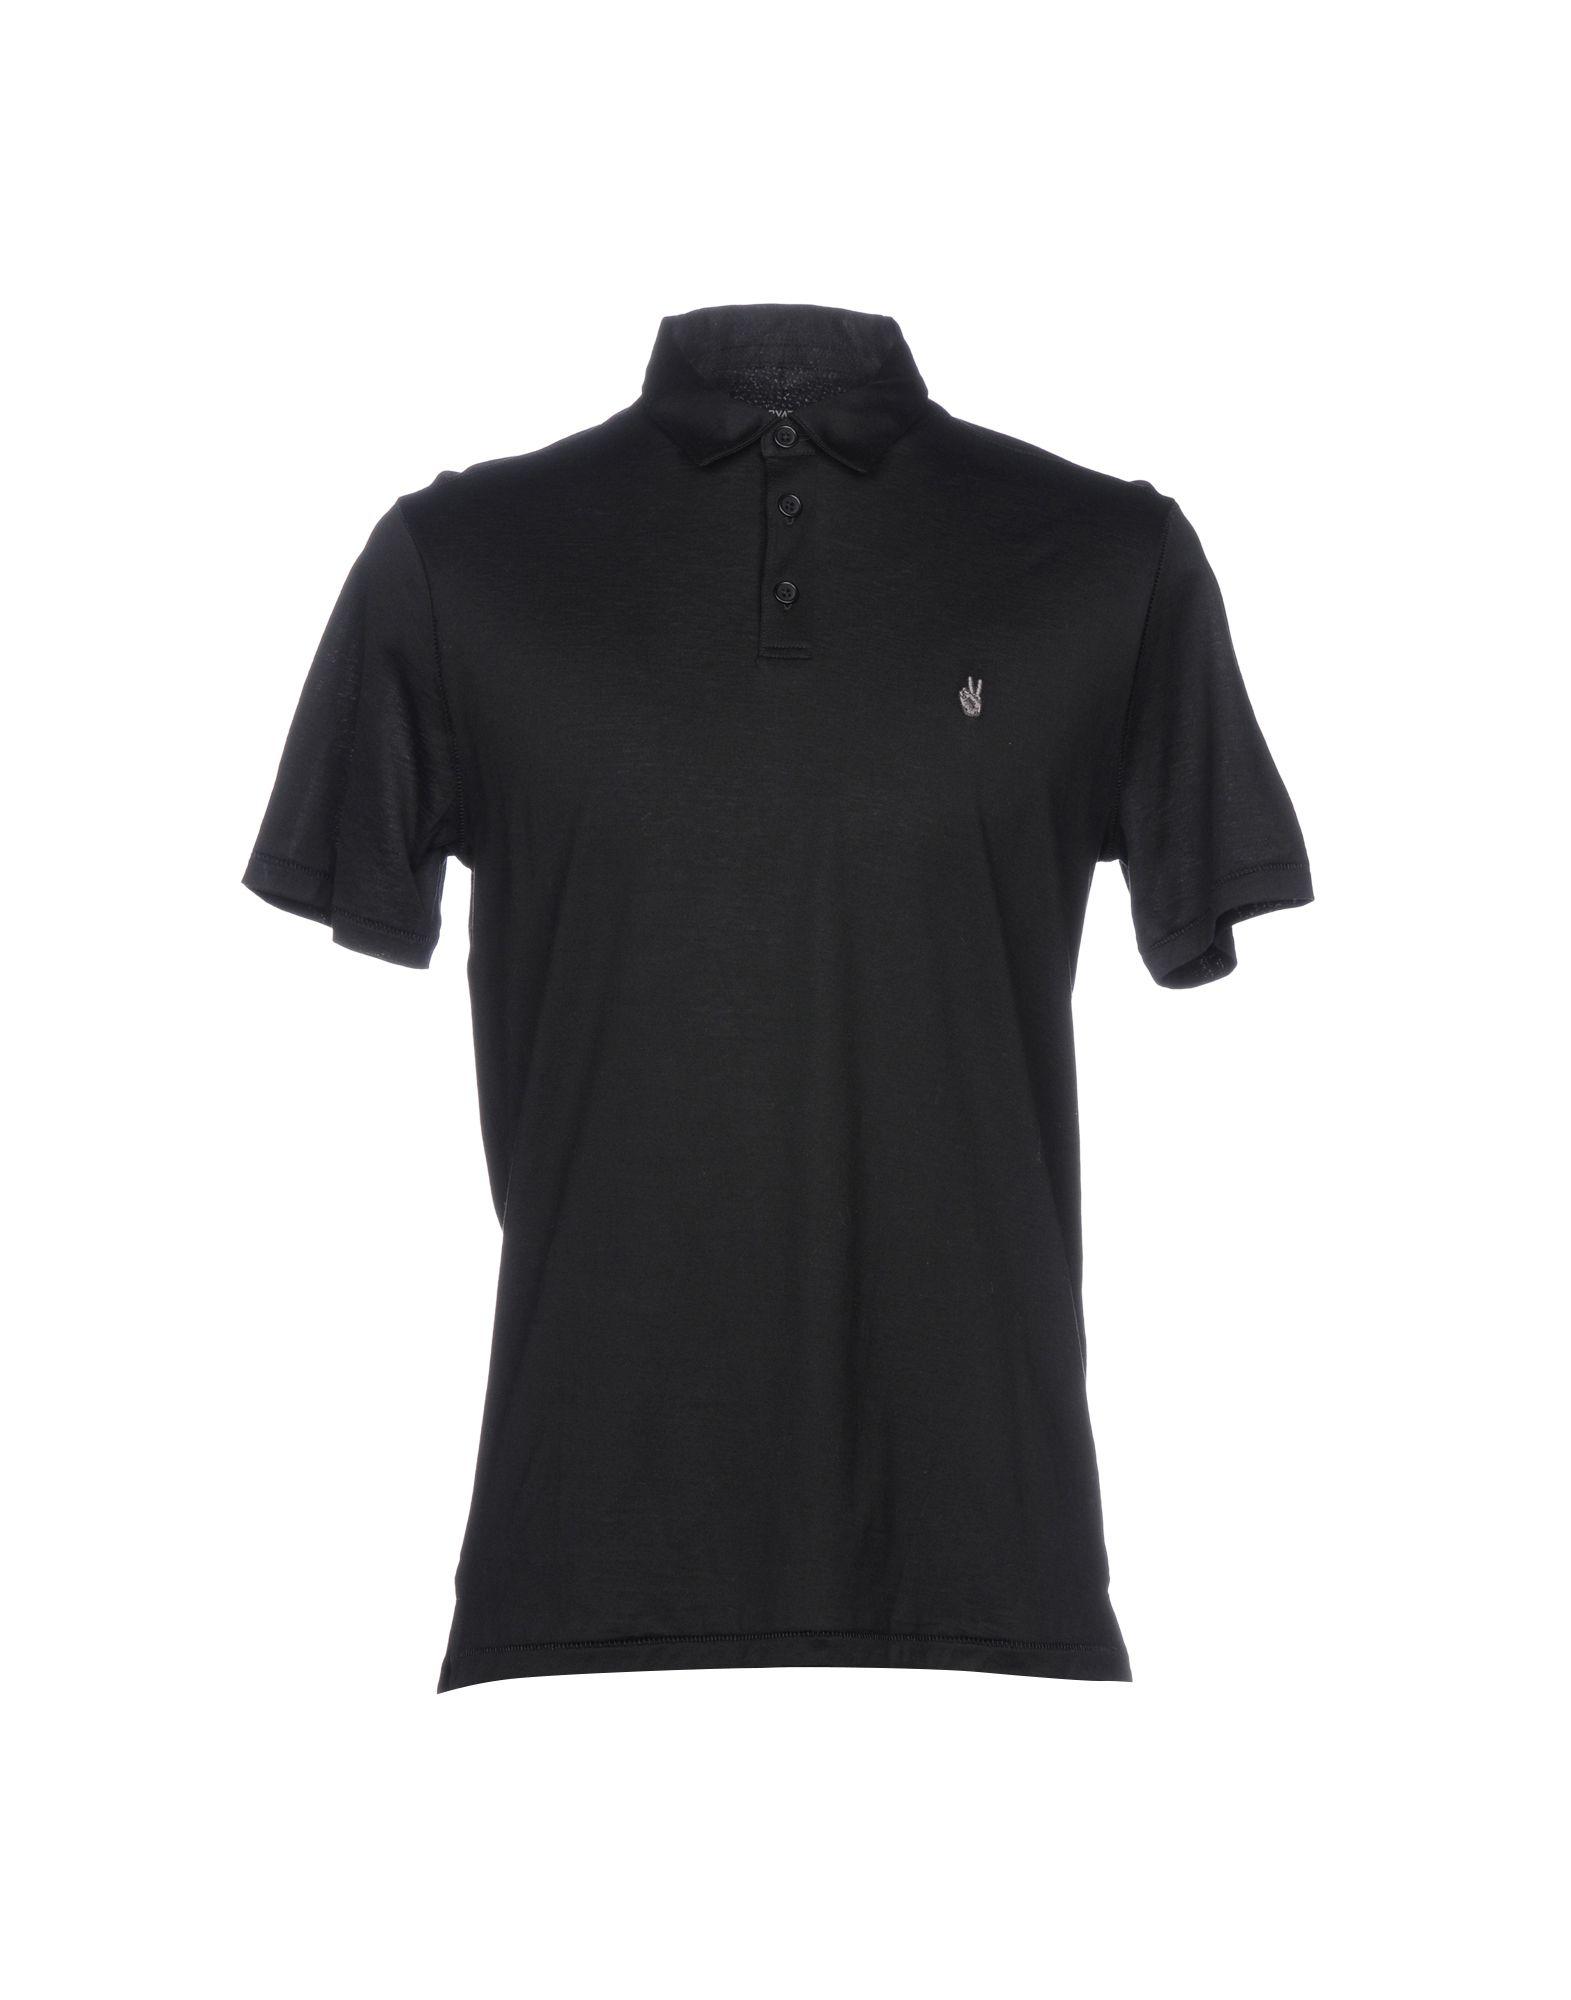 El U Y a s John Camisetas Yoox negro Varvatos Tops 5qSxqw8